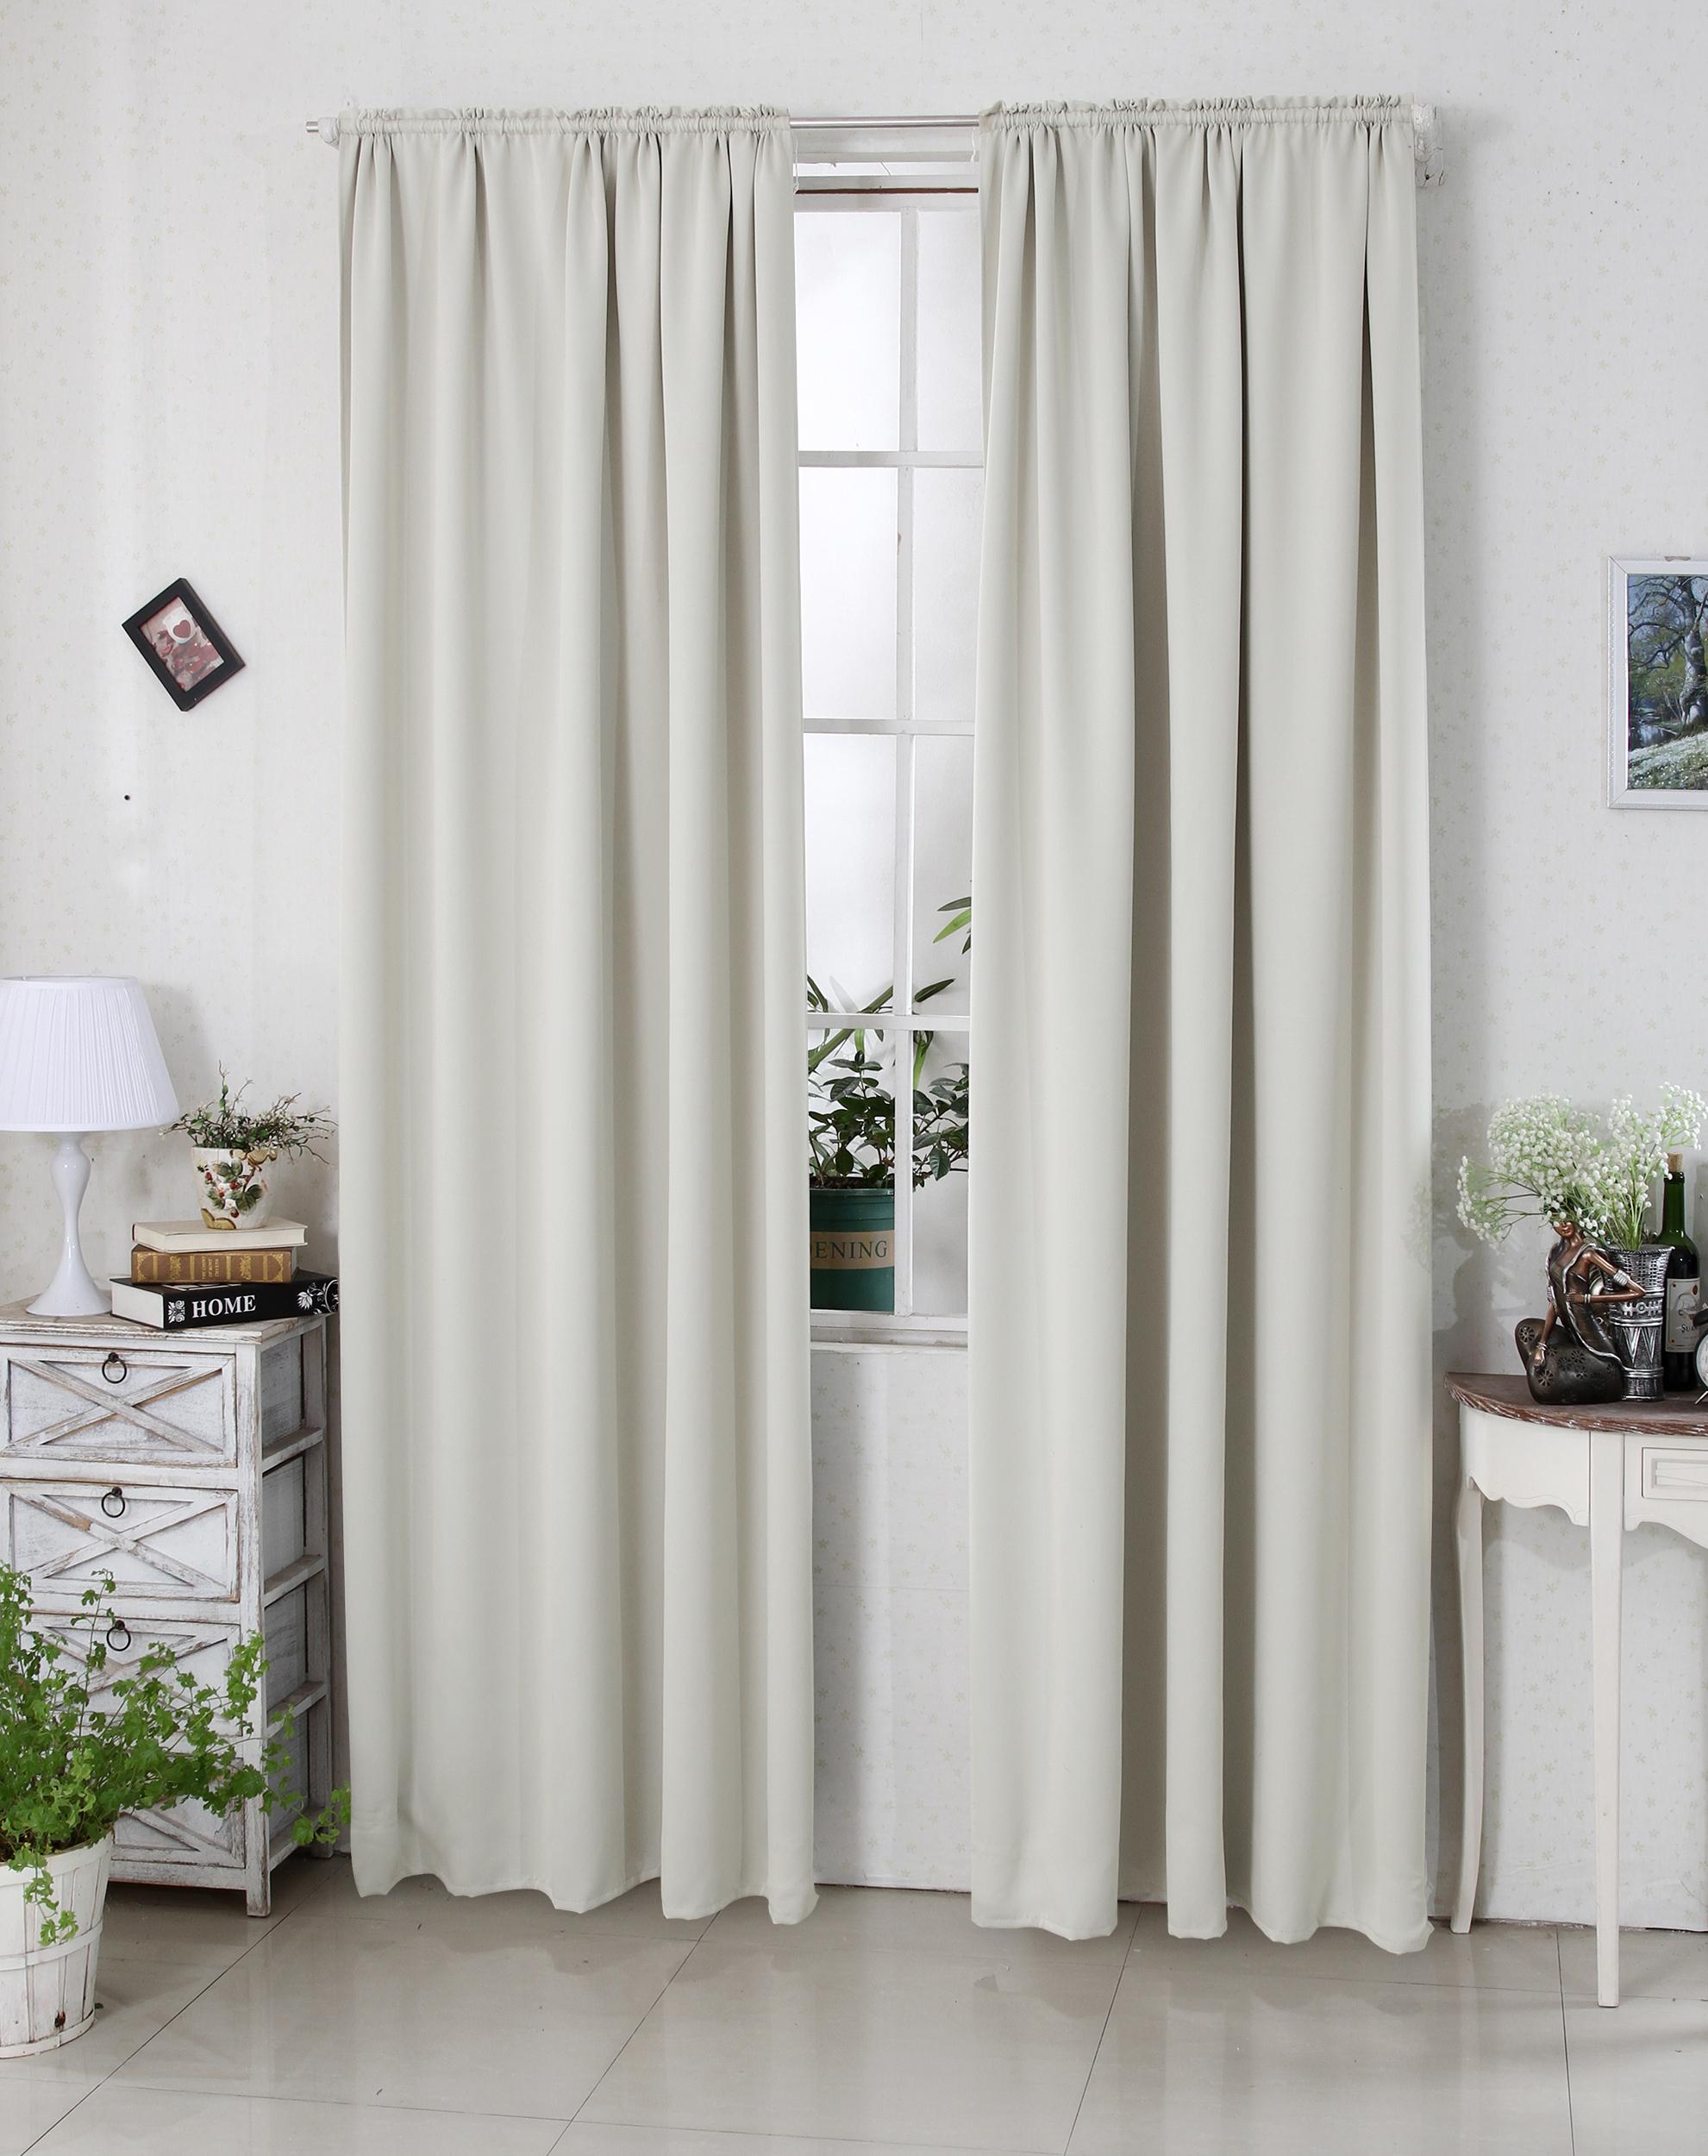 verdunklungsvorhang thermogardine kr uselband blickdicht gardine 140x245 cm 191 ebay. Black Bedroom Furniture Sets. Home Design Ideas